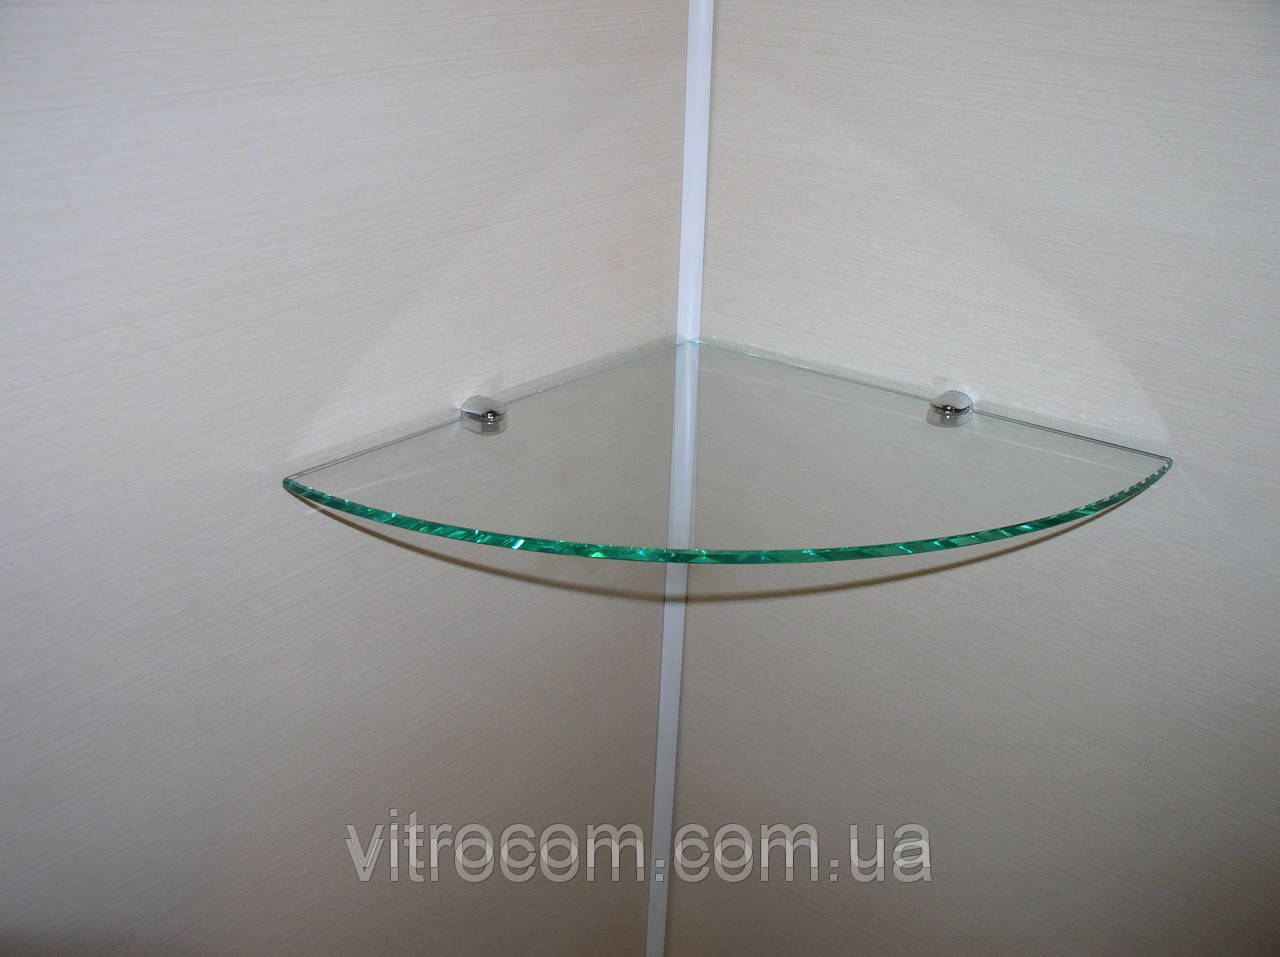 Полка стеклянная угловая 6 мм прозрачная 23 х 23 см